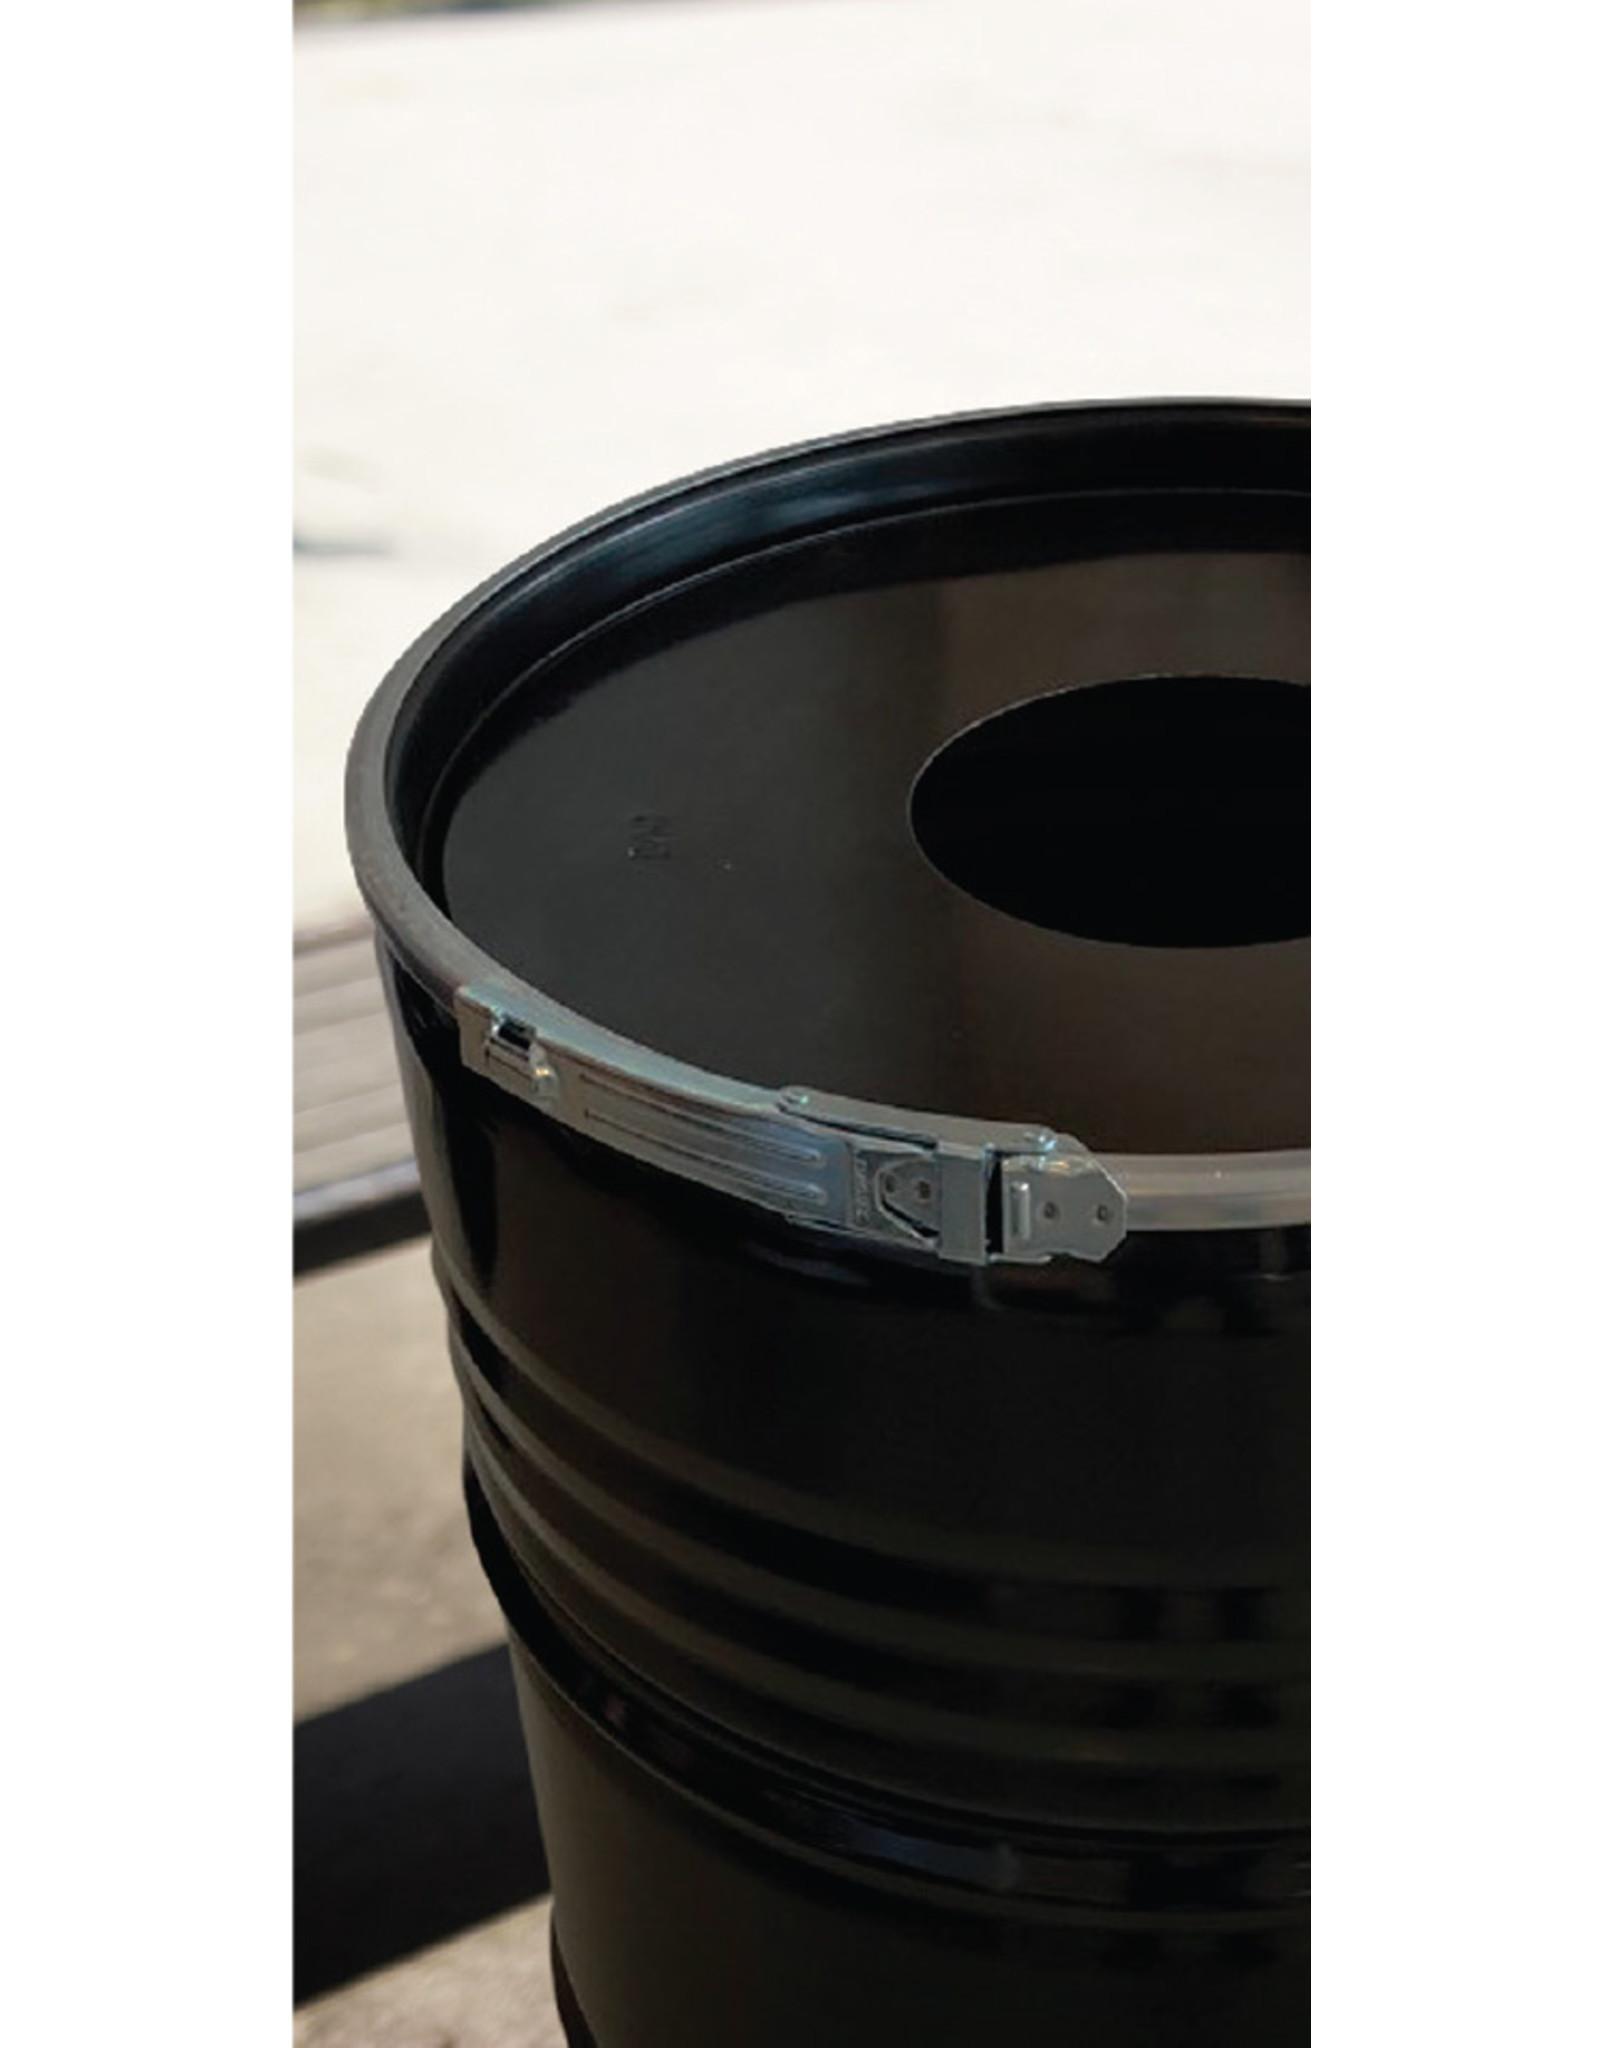 The Binbin BinBin Hole Industriële prullenbak zwart 200 Liter met gat in deksel